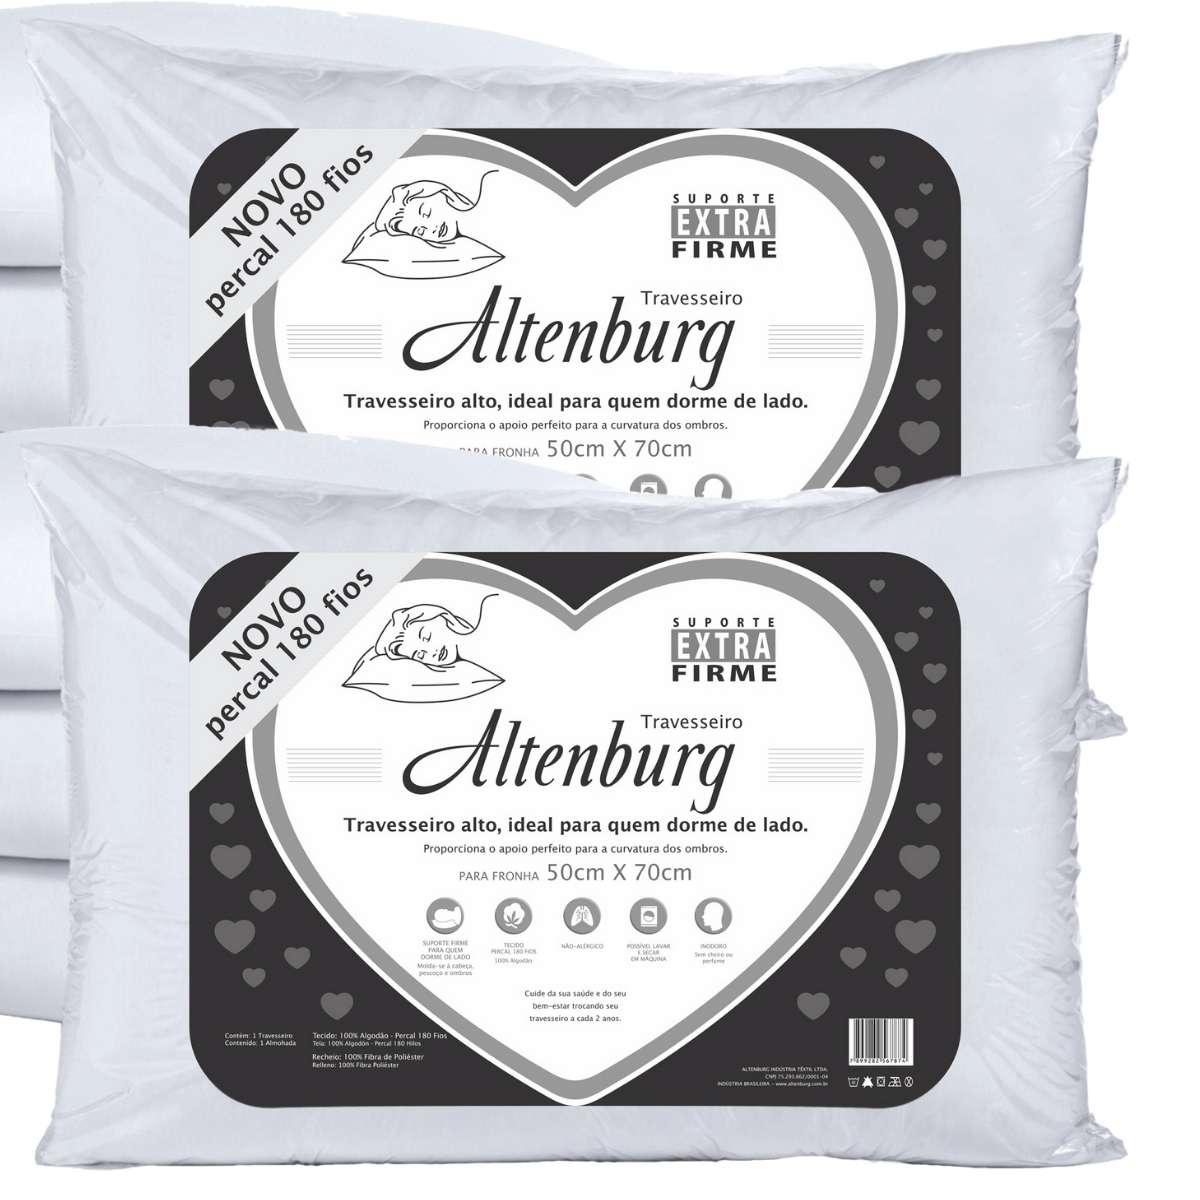 Travesseiros Extra Firme Altenburg - Kit 2 peças